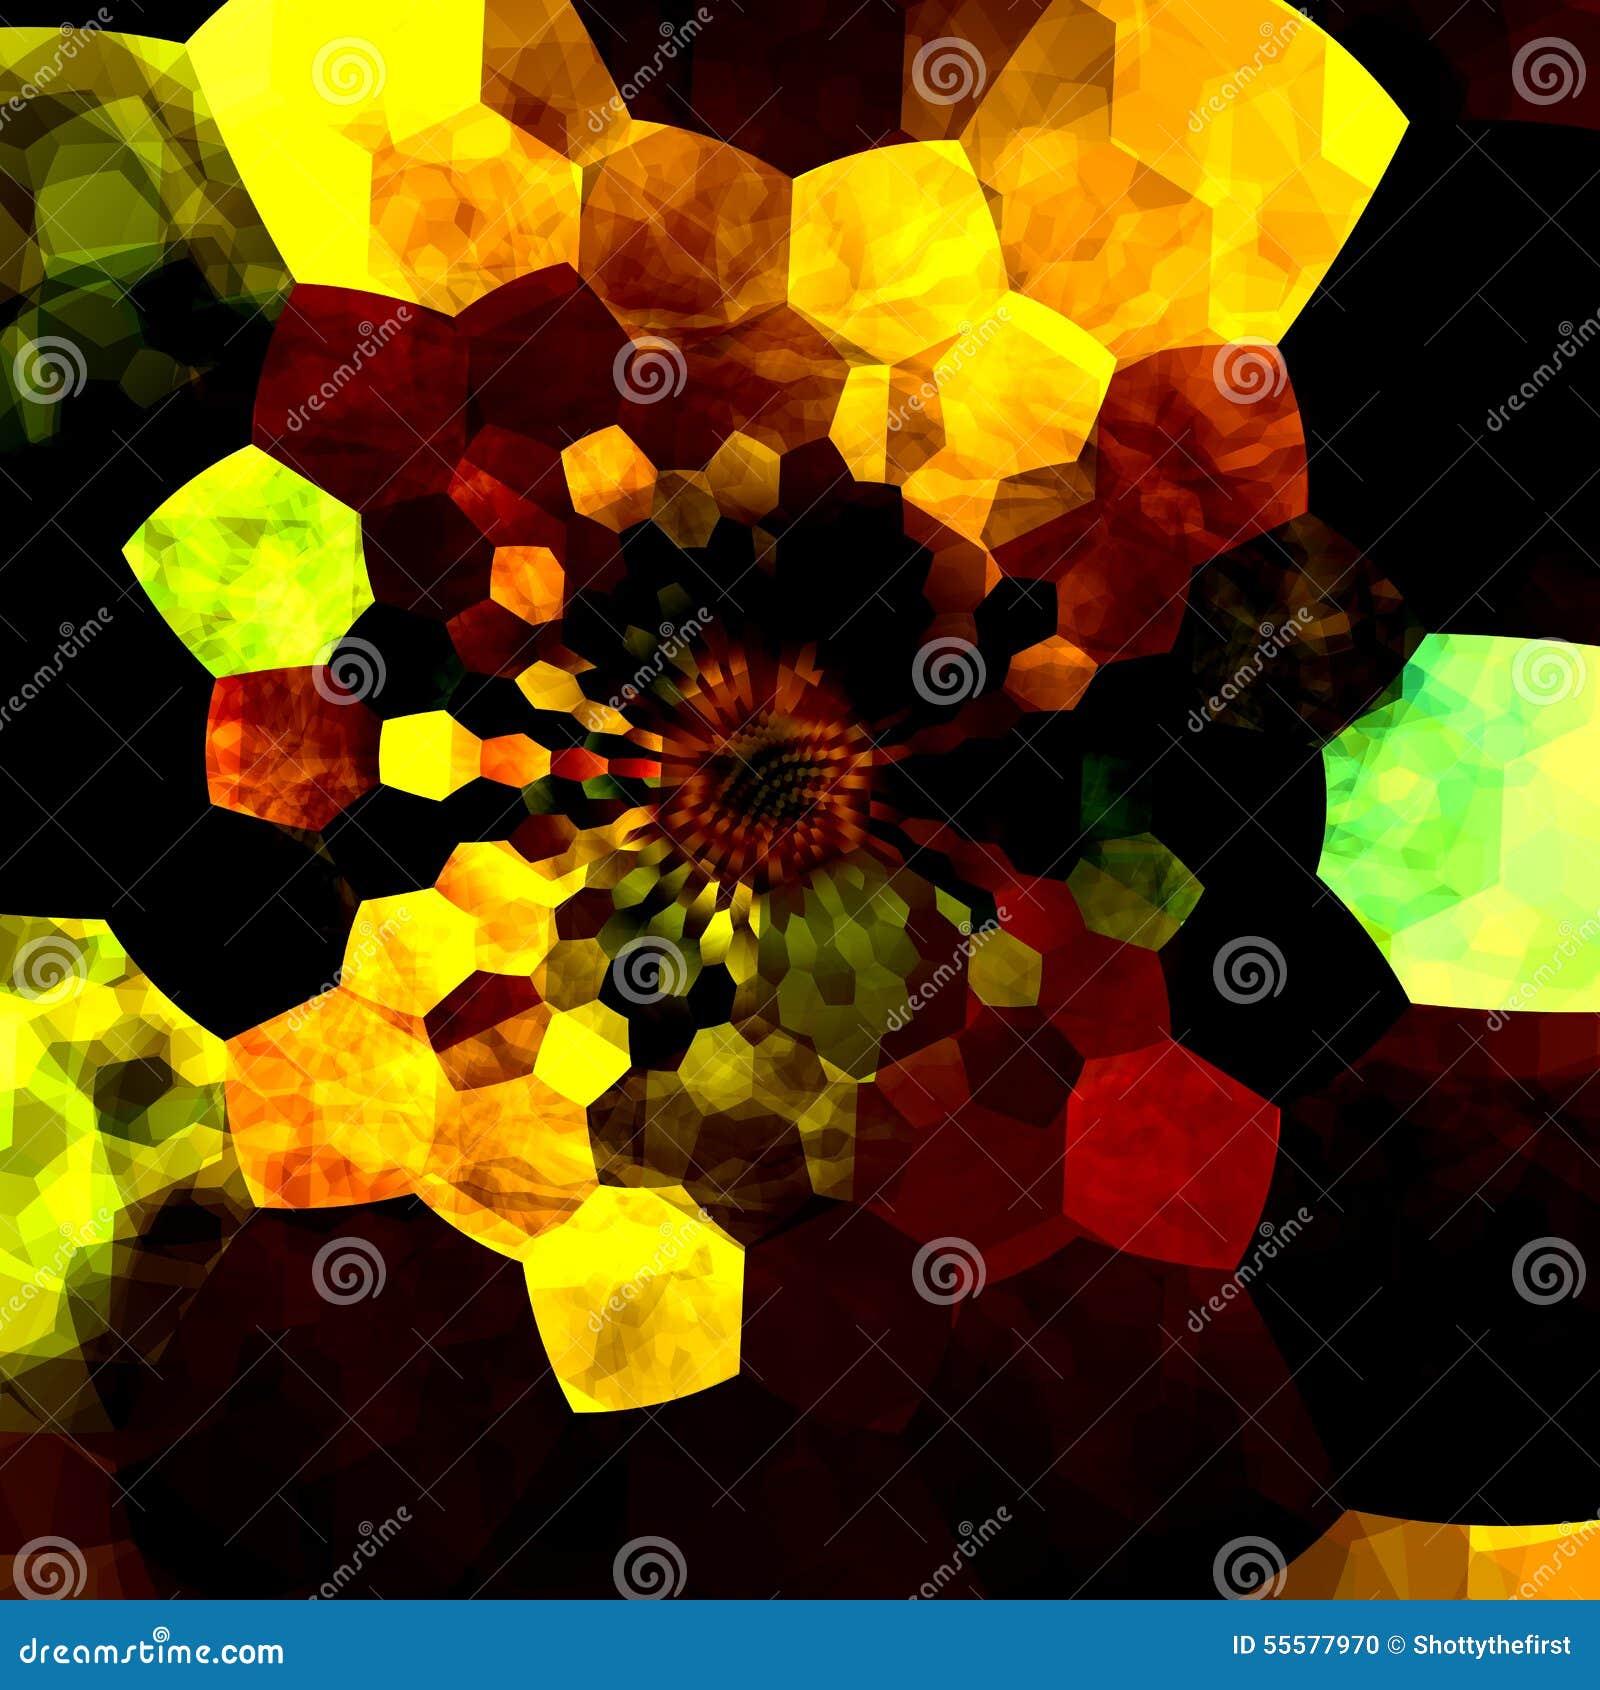 Artsy Background Design Illustration Art Composition Colors